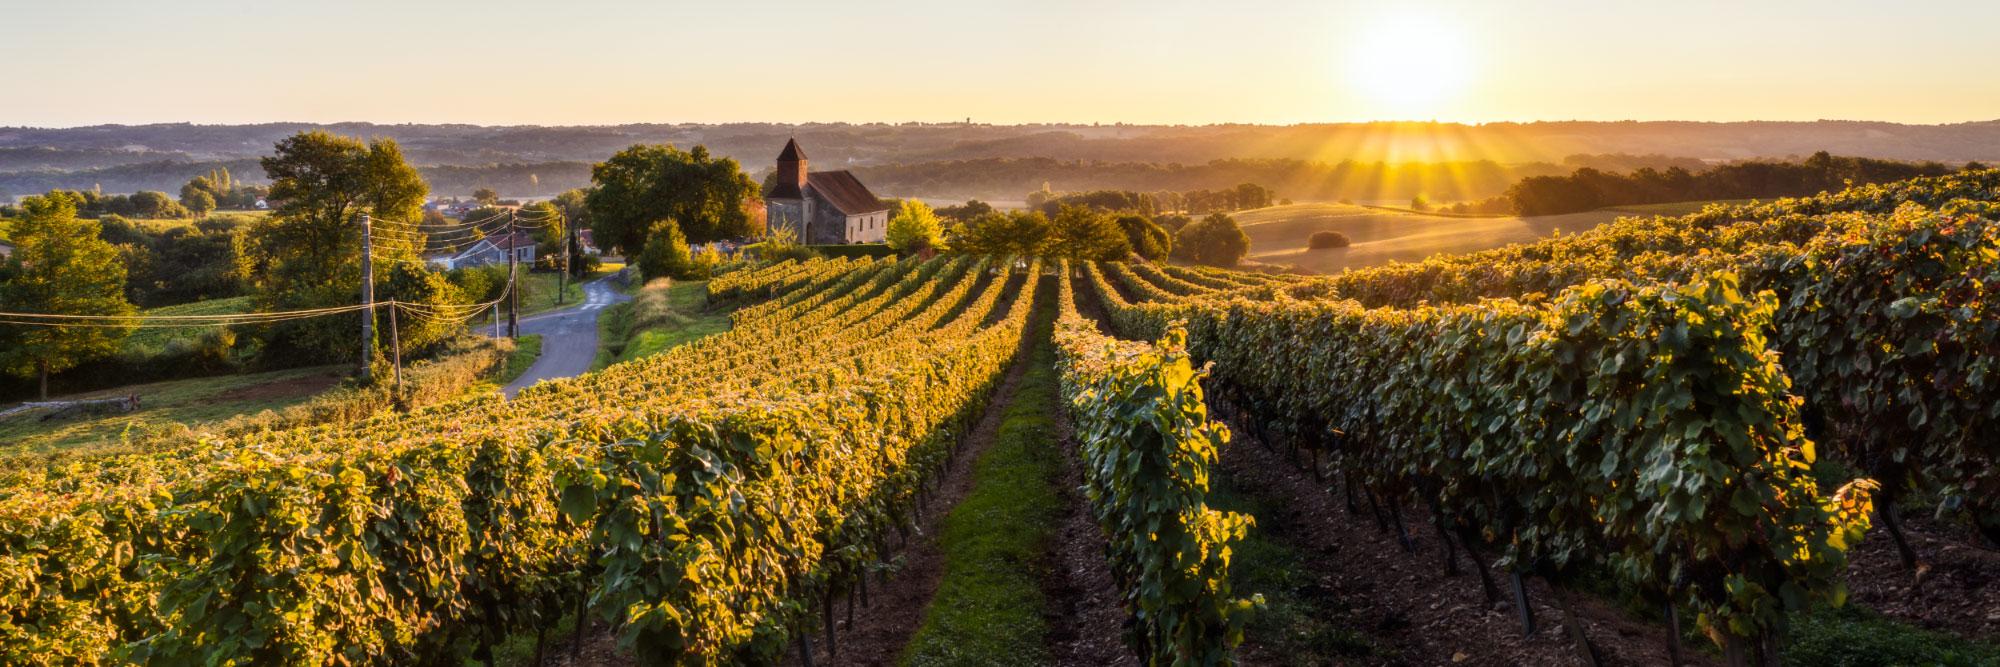 Crouseilles, vignoble de Madiran, Béarn